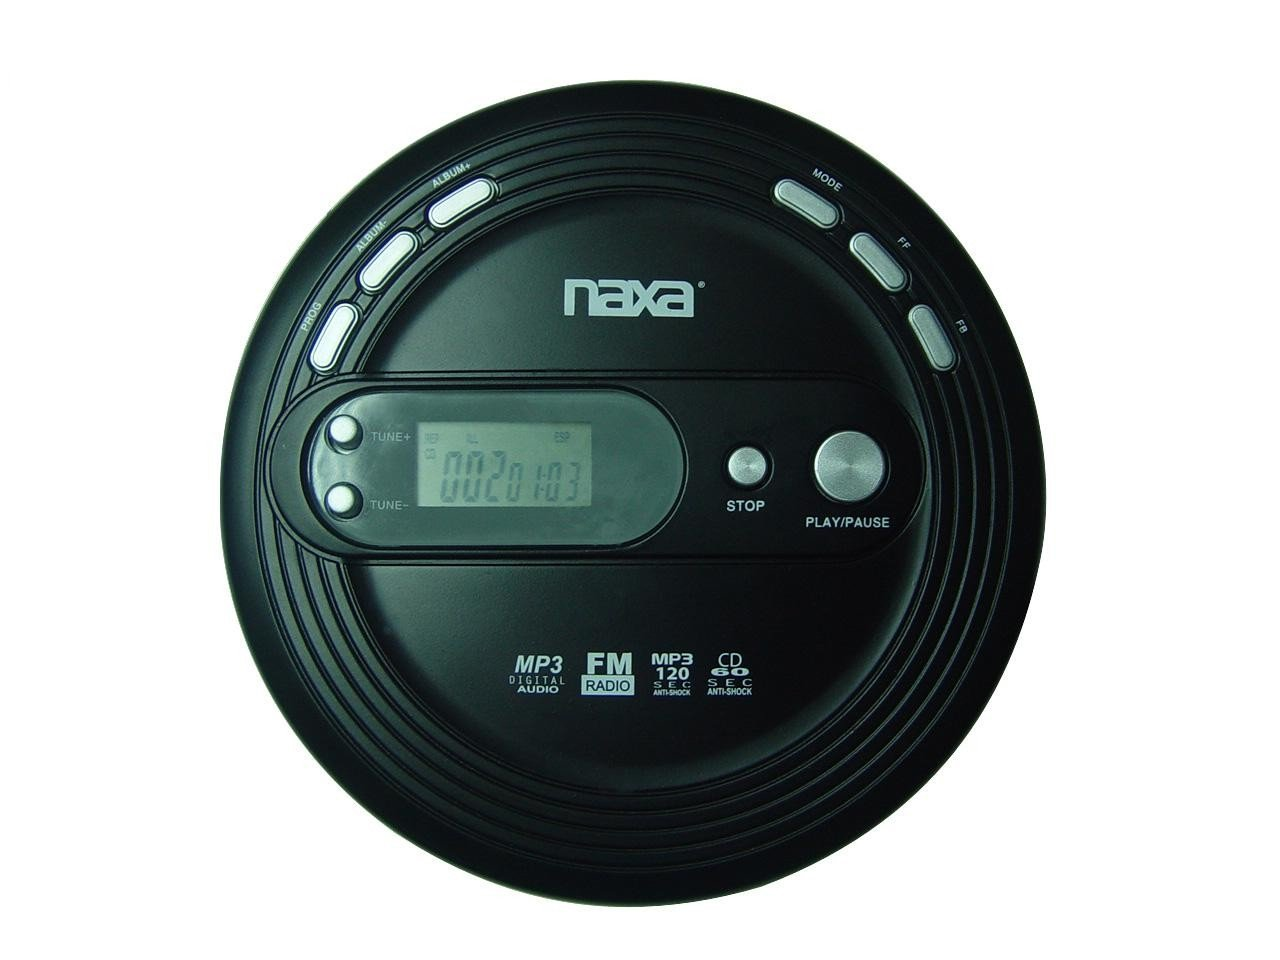 NAXA Electronics NPC-330 Slim Portable Cd and MP3 Player with FM Radio & Anti-Shock Technology